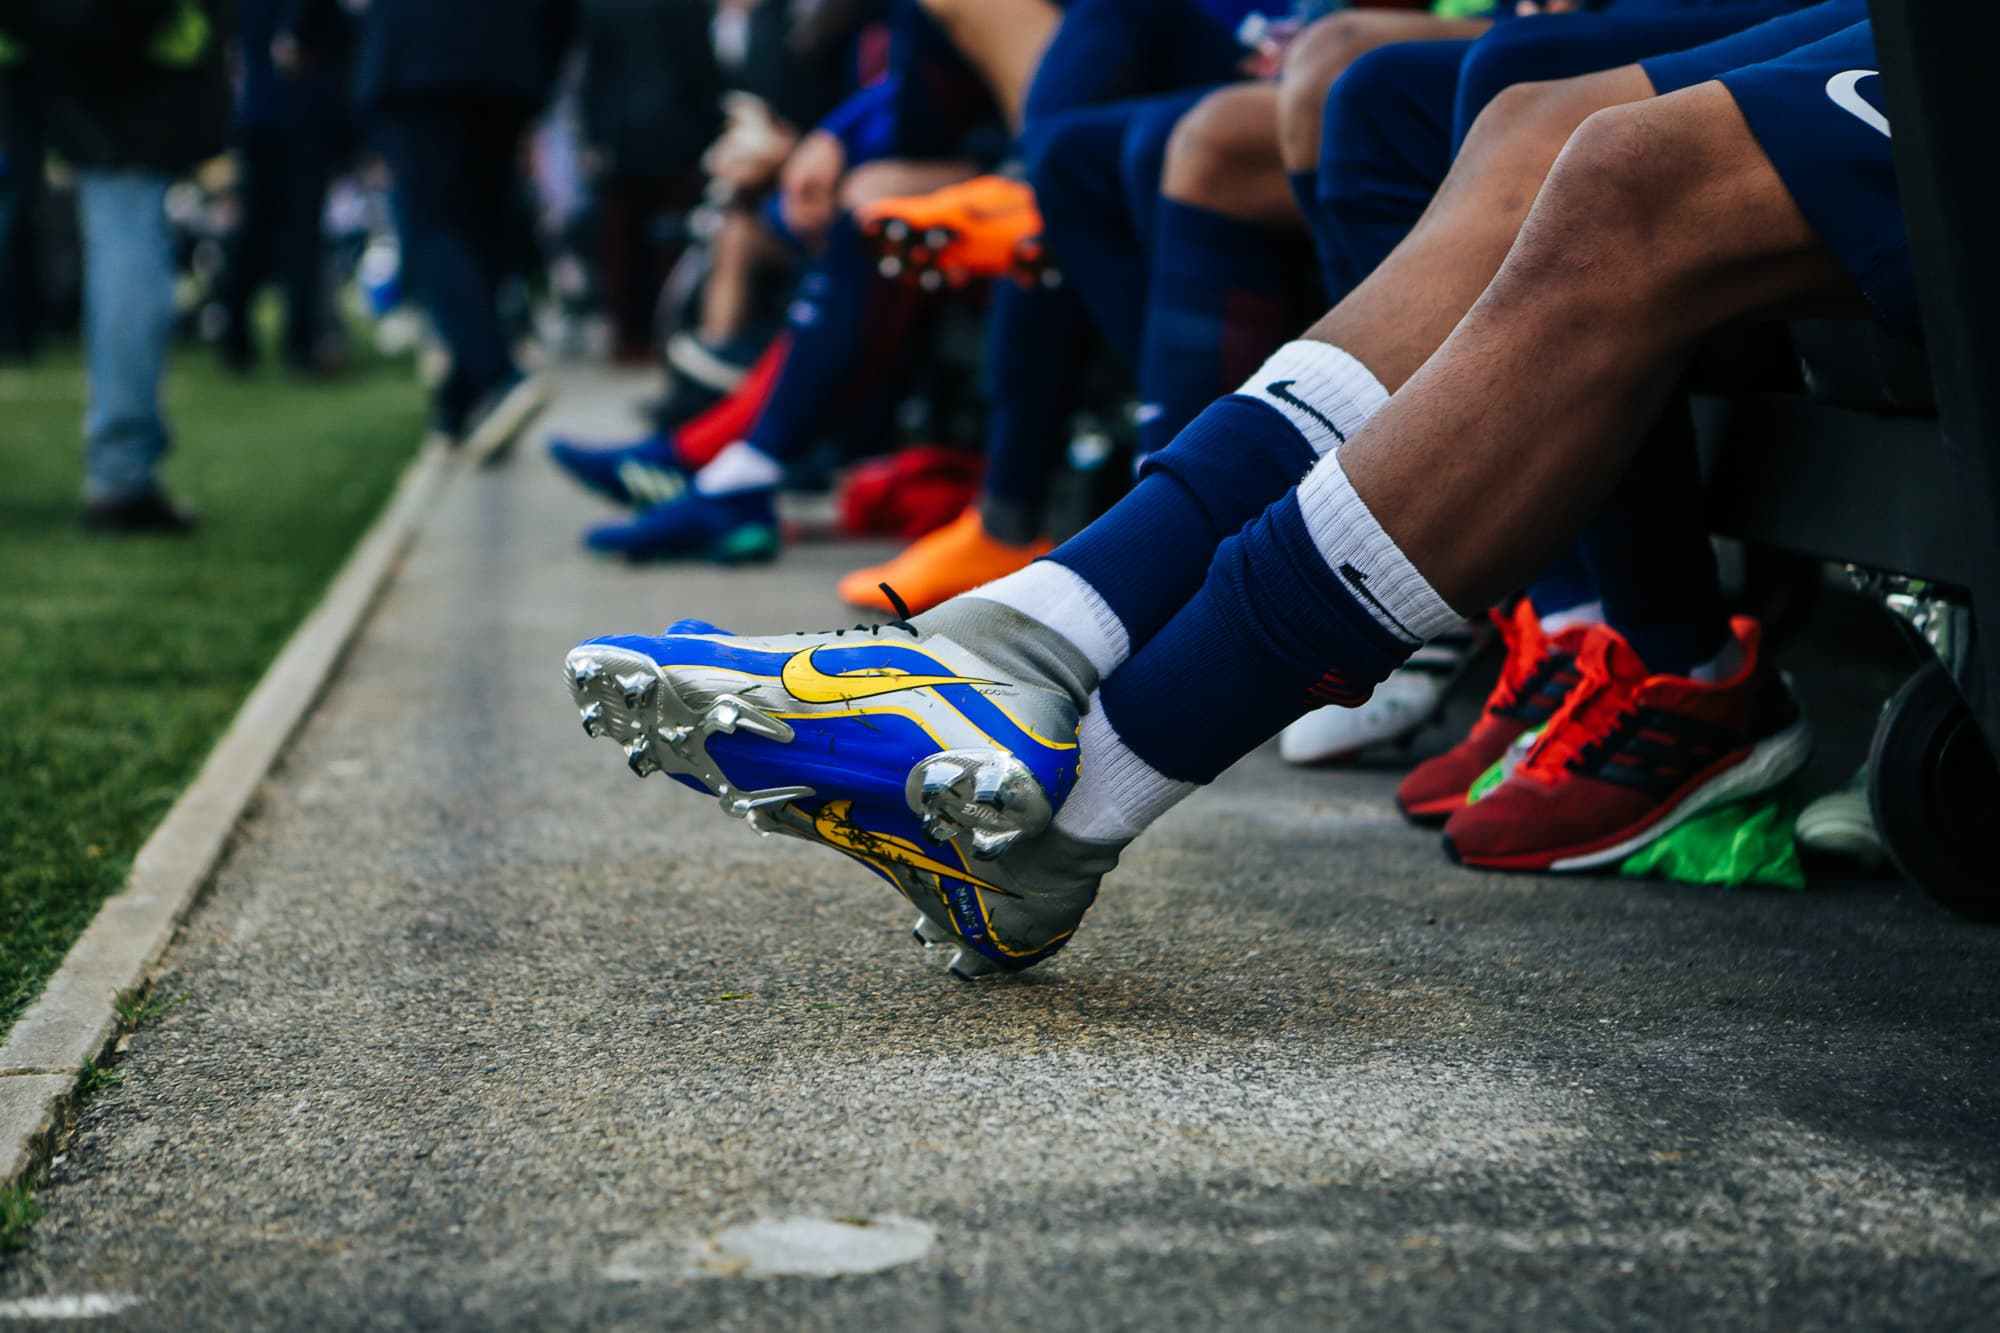 Chaussures-football-nike-mercurial-heritage-1998-mai-2018